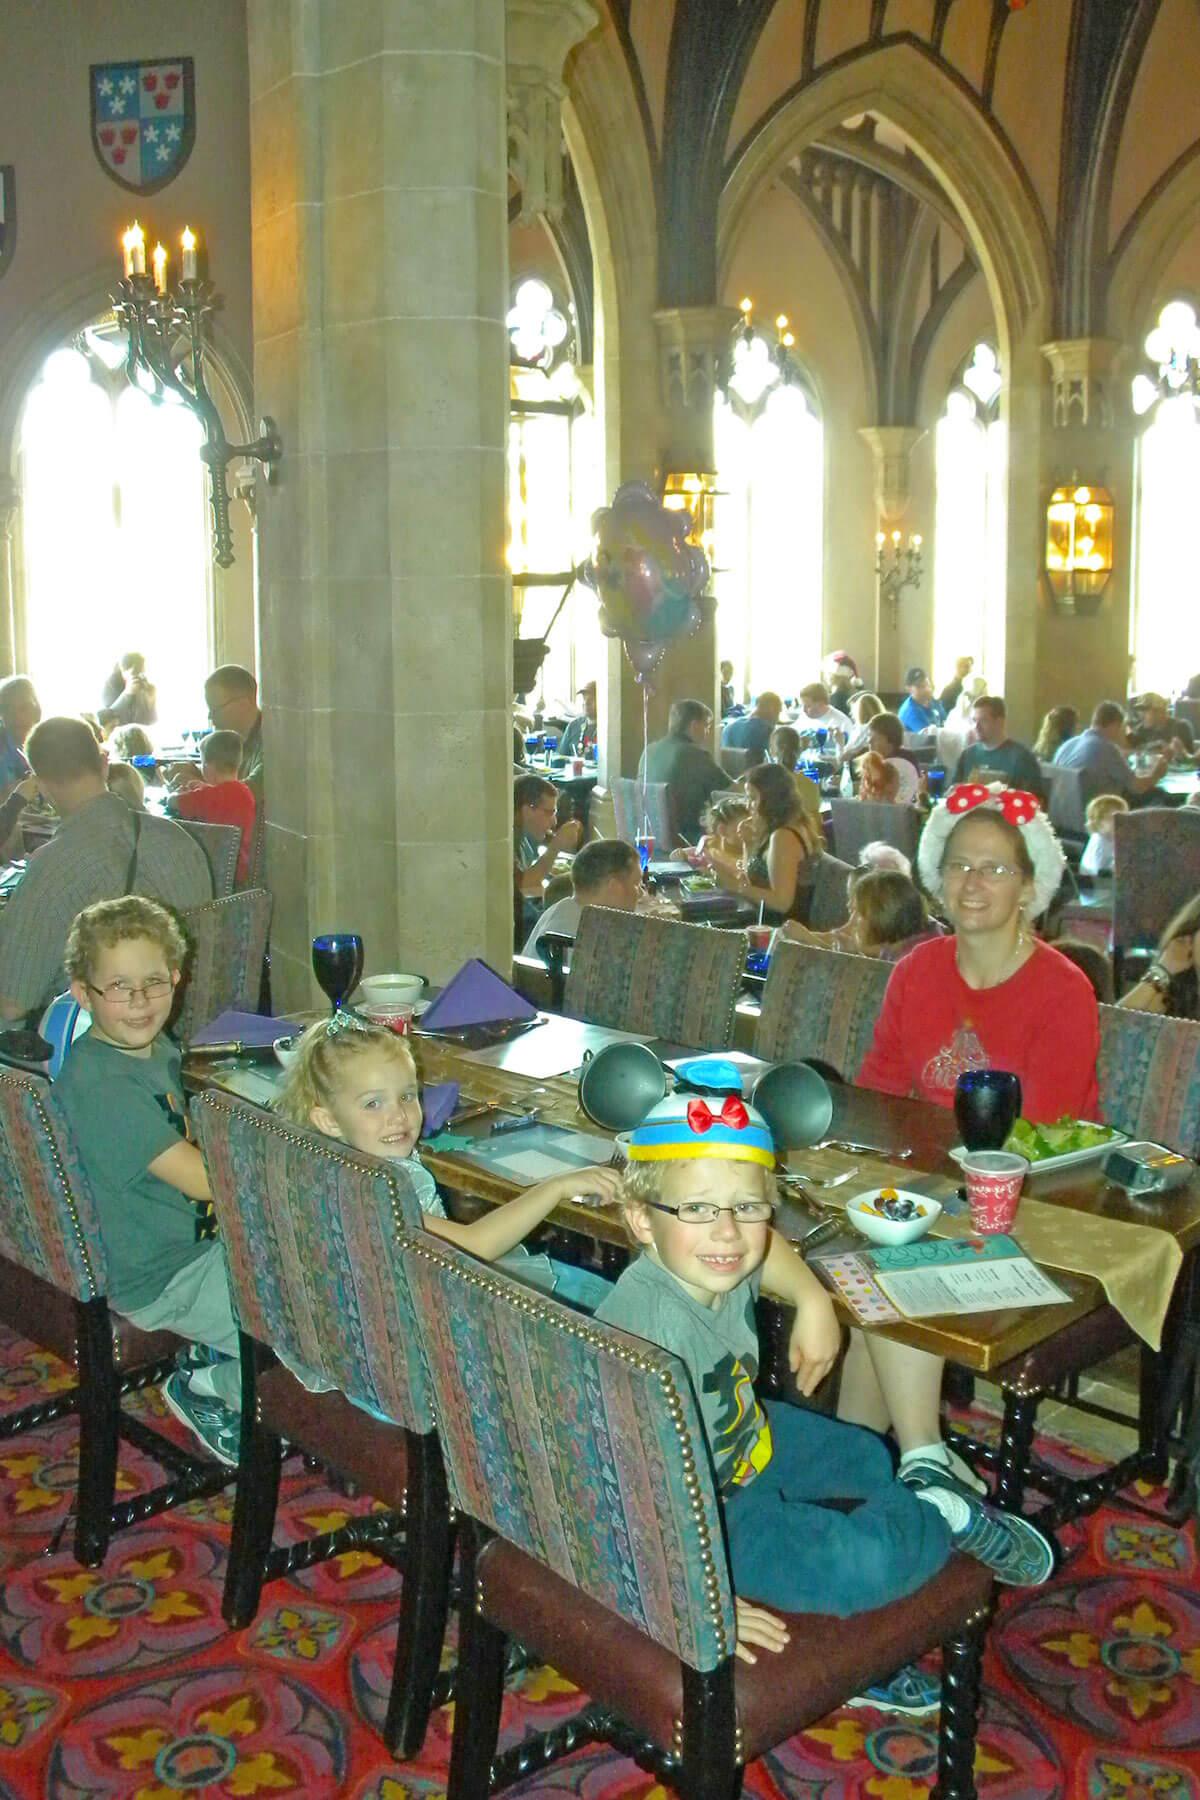 Disney World planning timeline - Cinderella's Royal Table